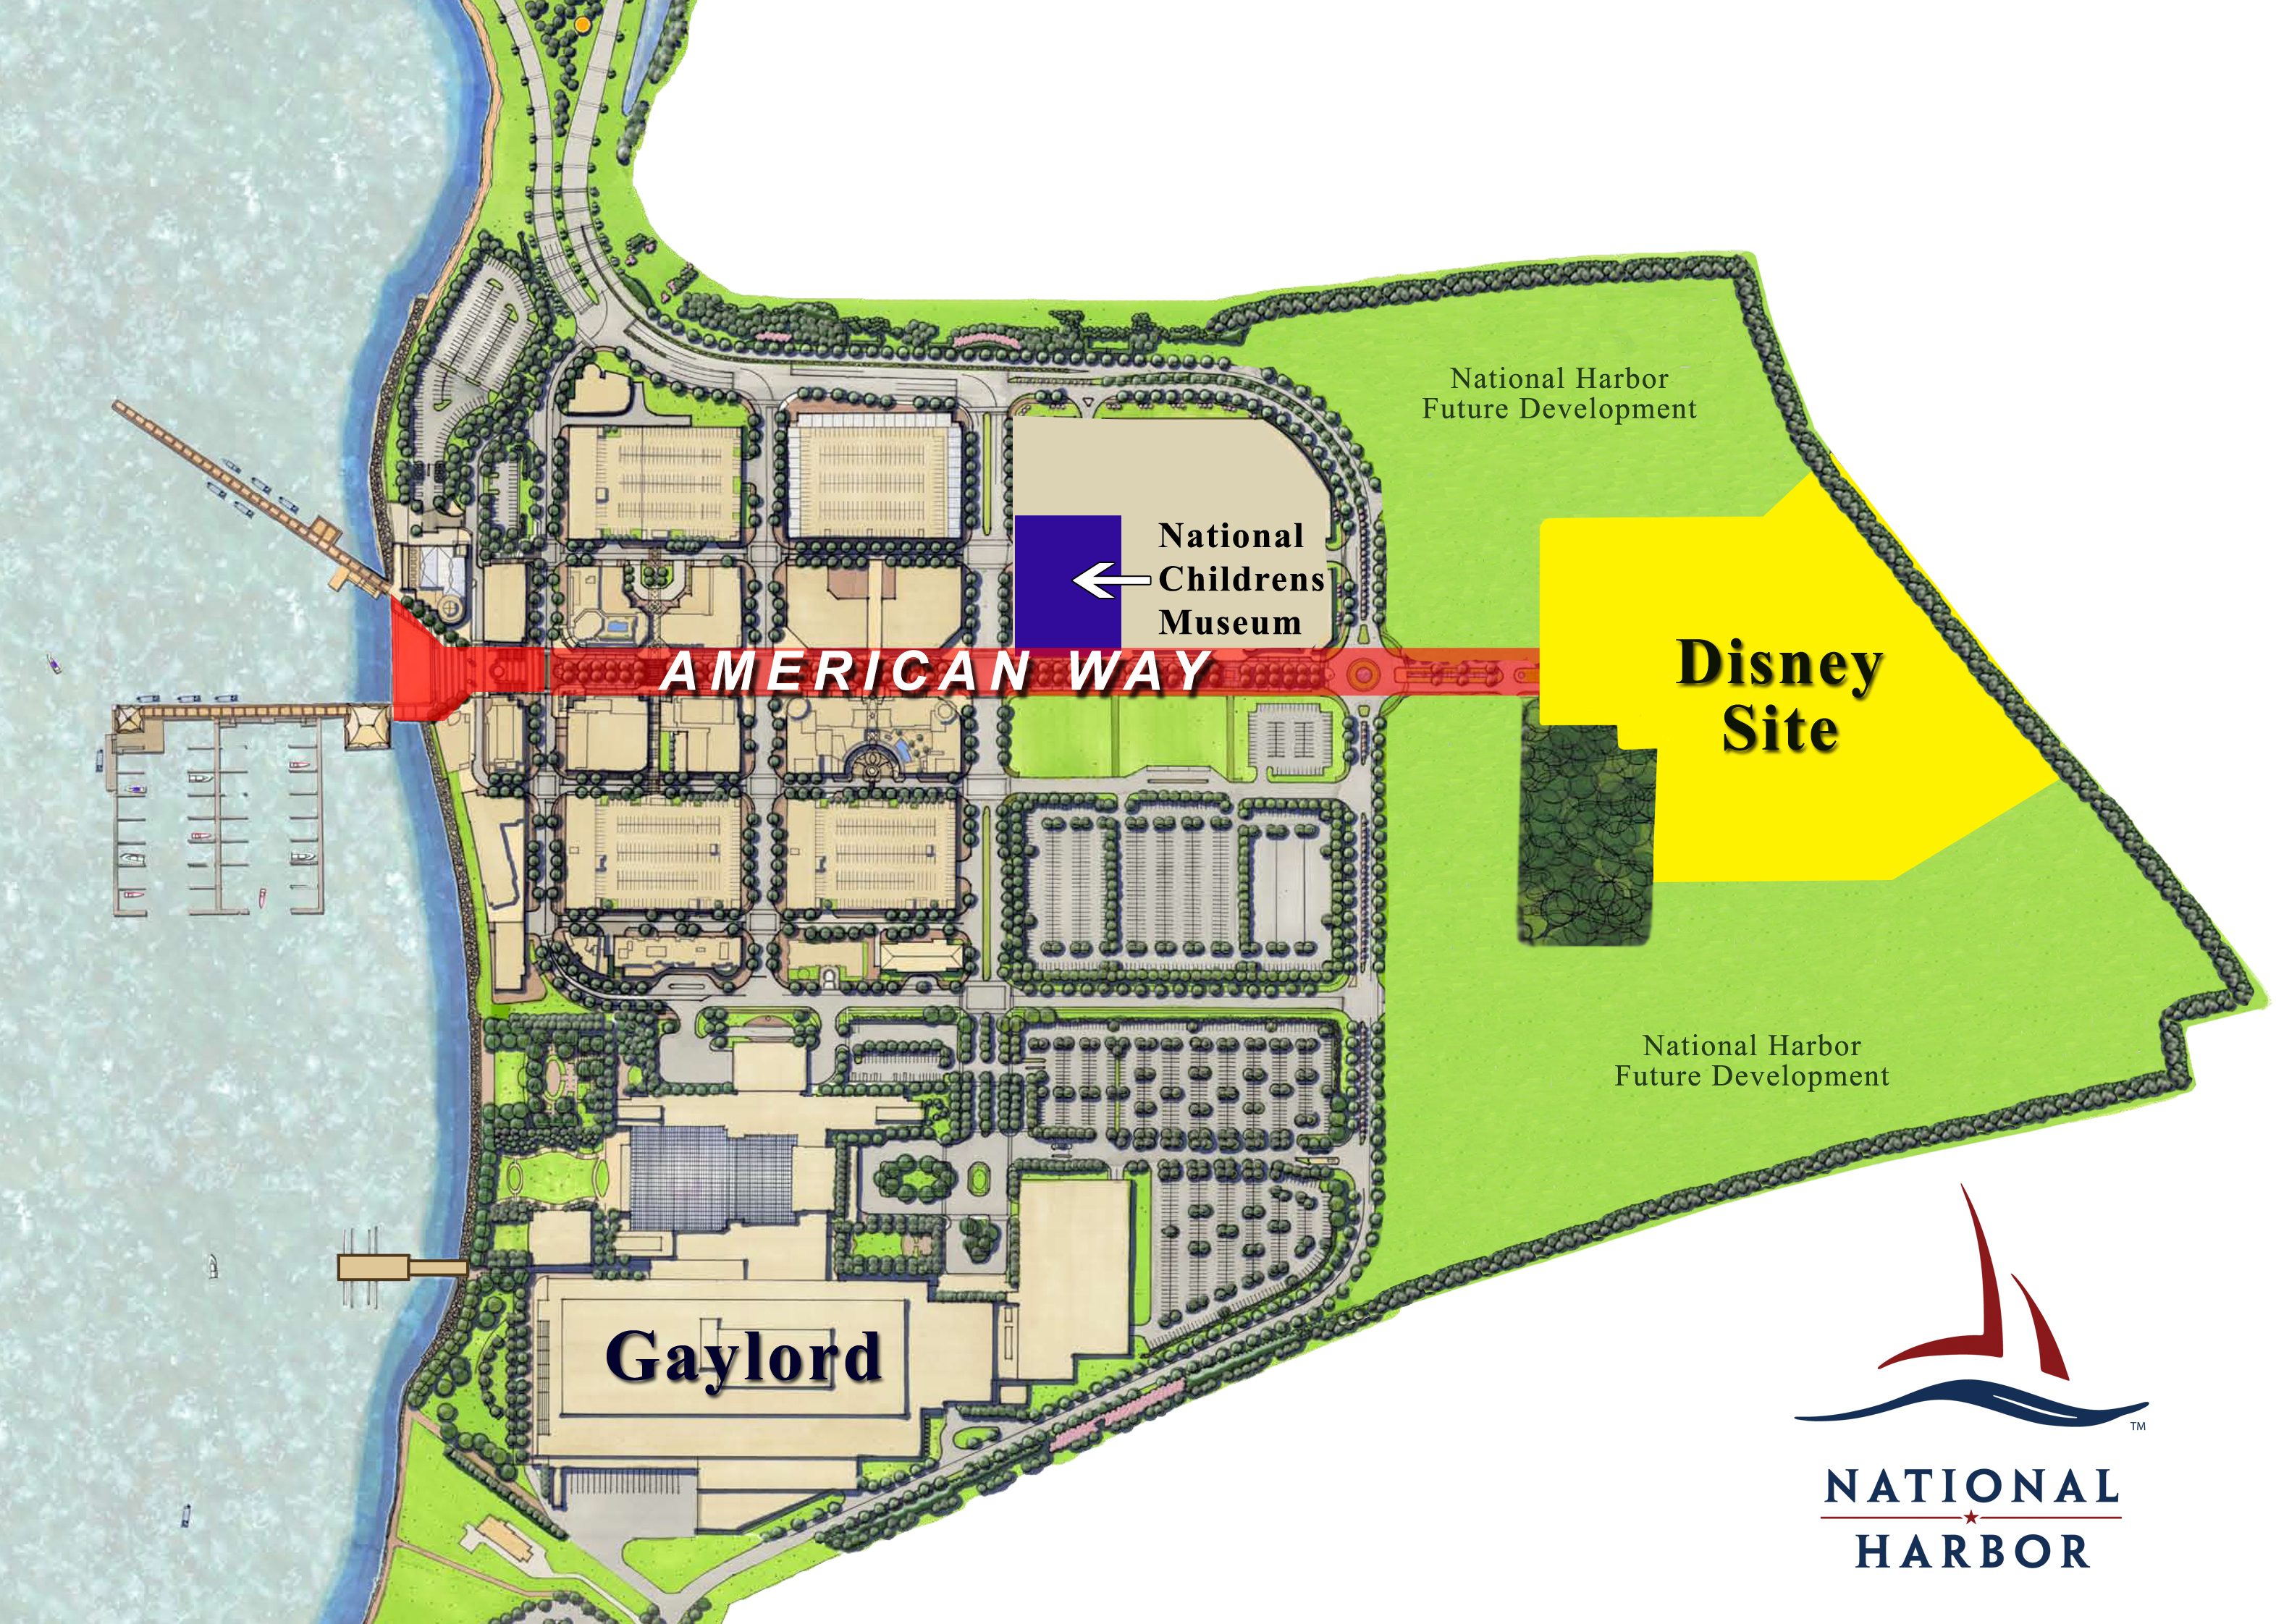 Disney Purchases Washington DC Land to Build New Resort Hotel